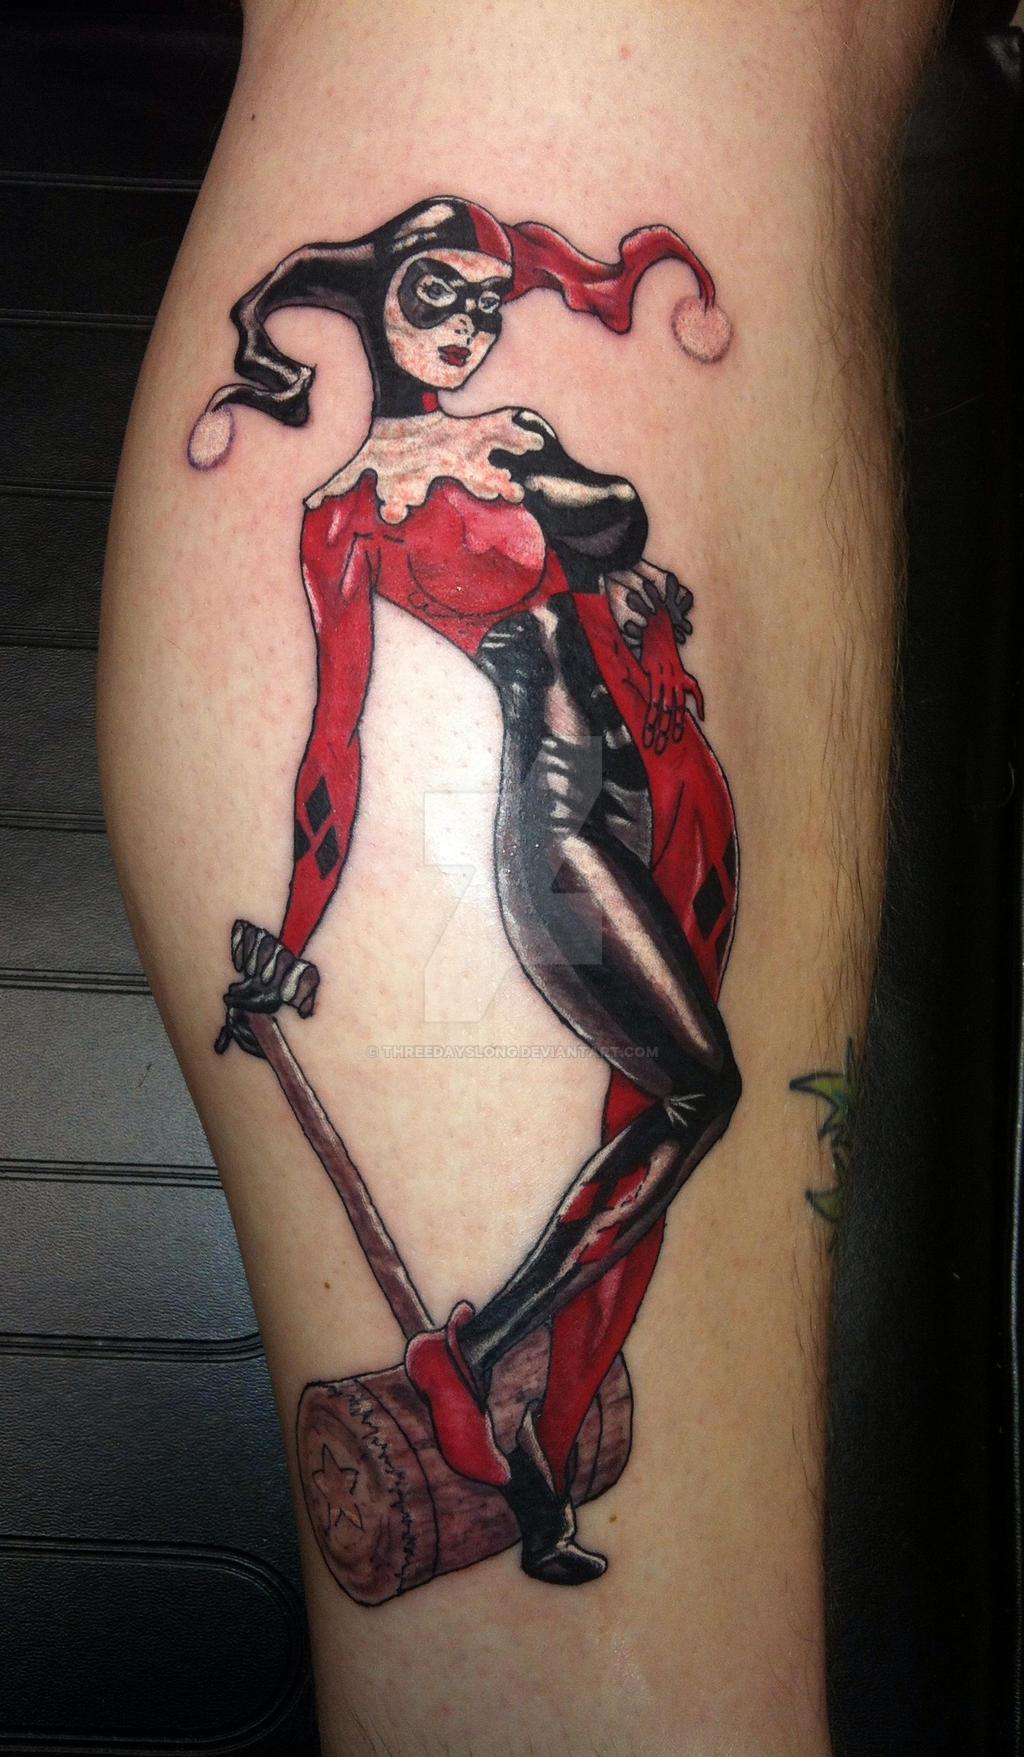 Harley quinn tattoo by threedayslong on deviantart for Harley quinn and joker tattoo